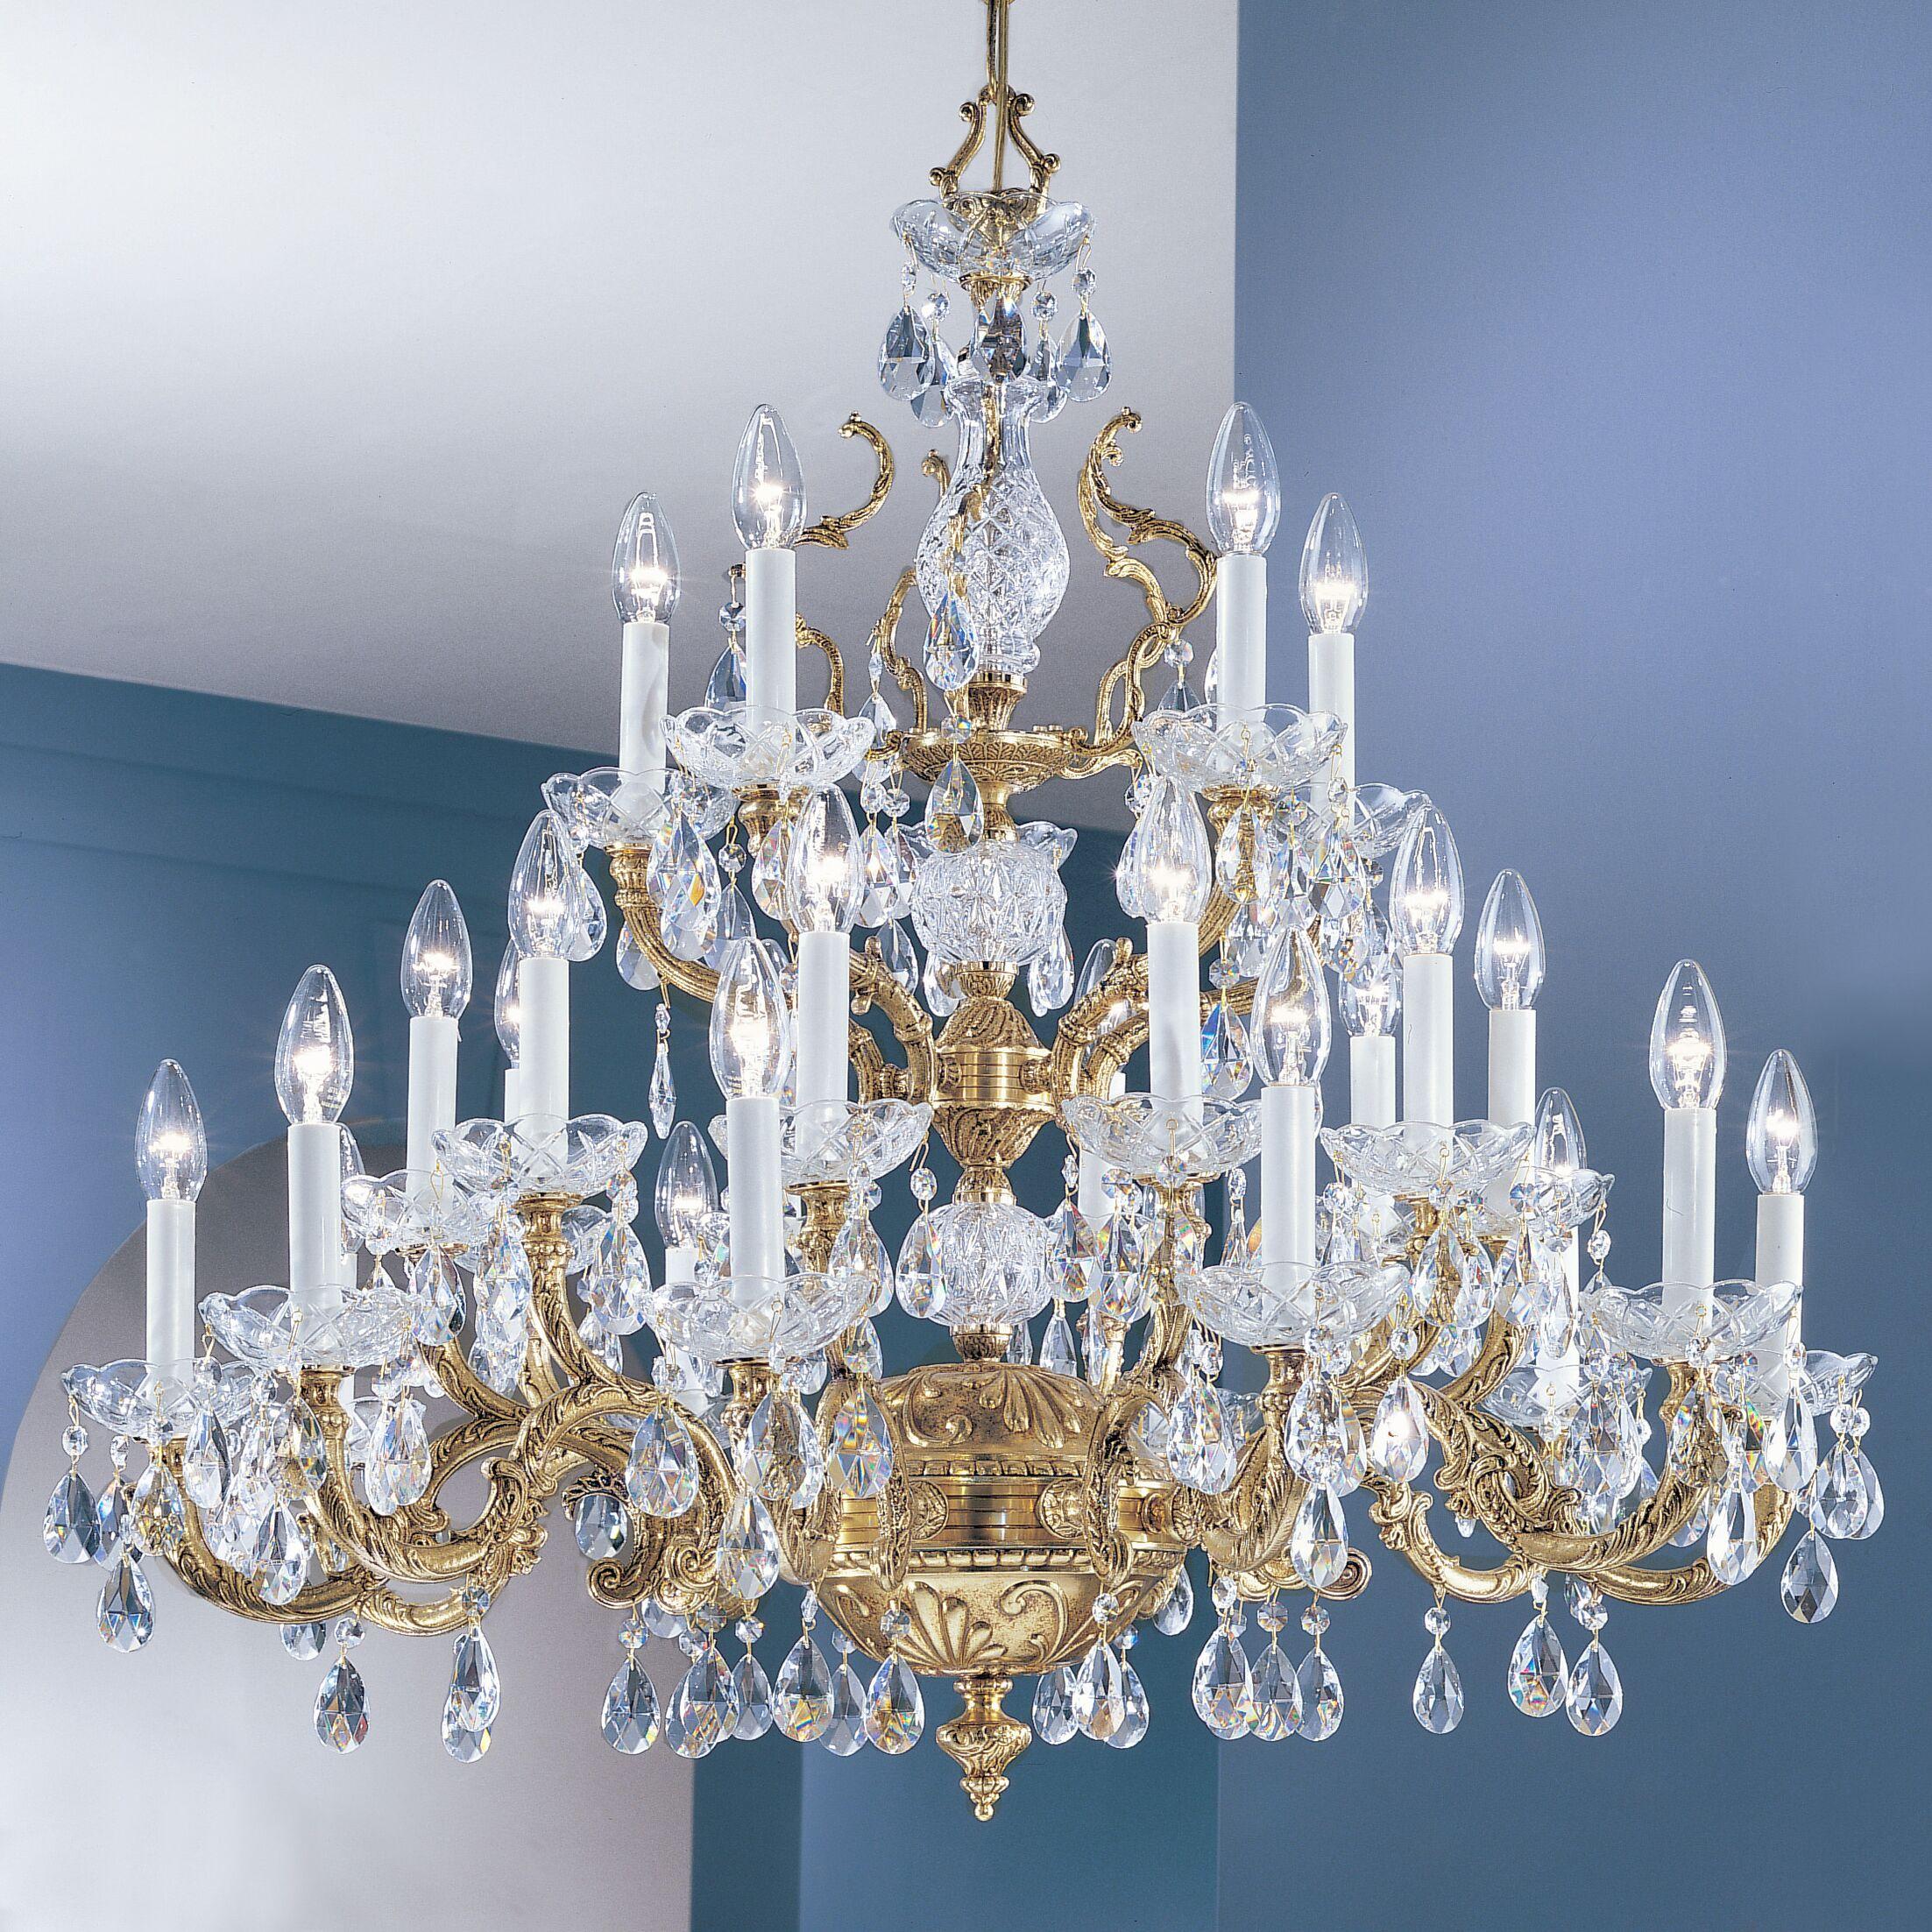 Madrid 25-Light Candle Style Chandelier Finish: Olde World Bronze, Crystal Type: Swarovski Spectra